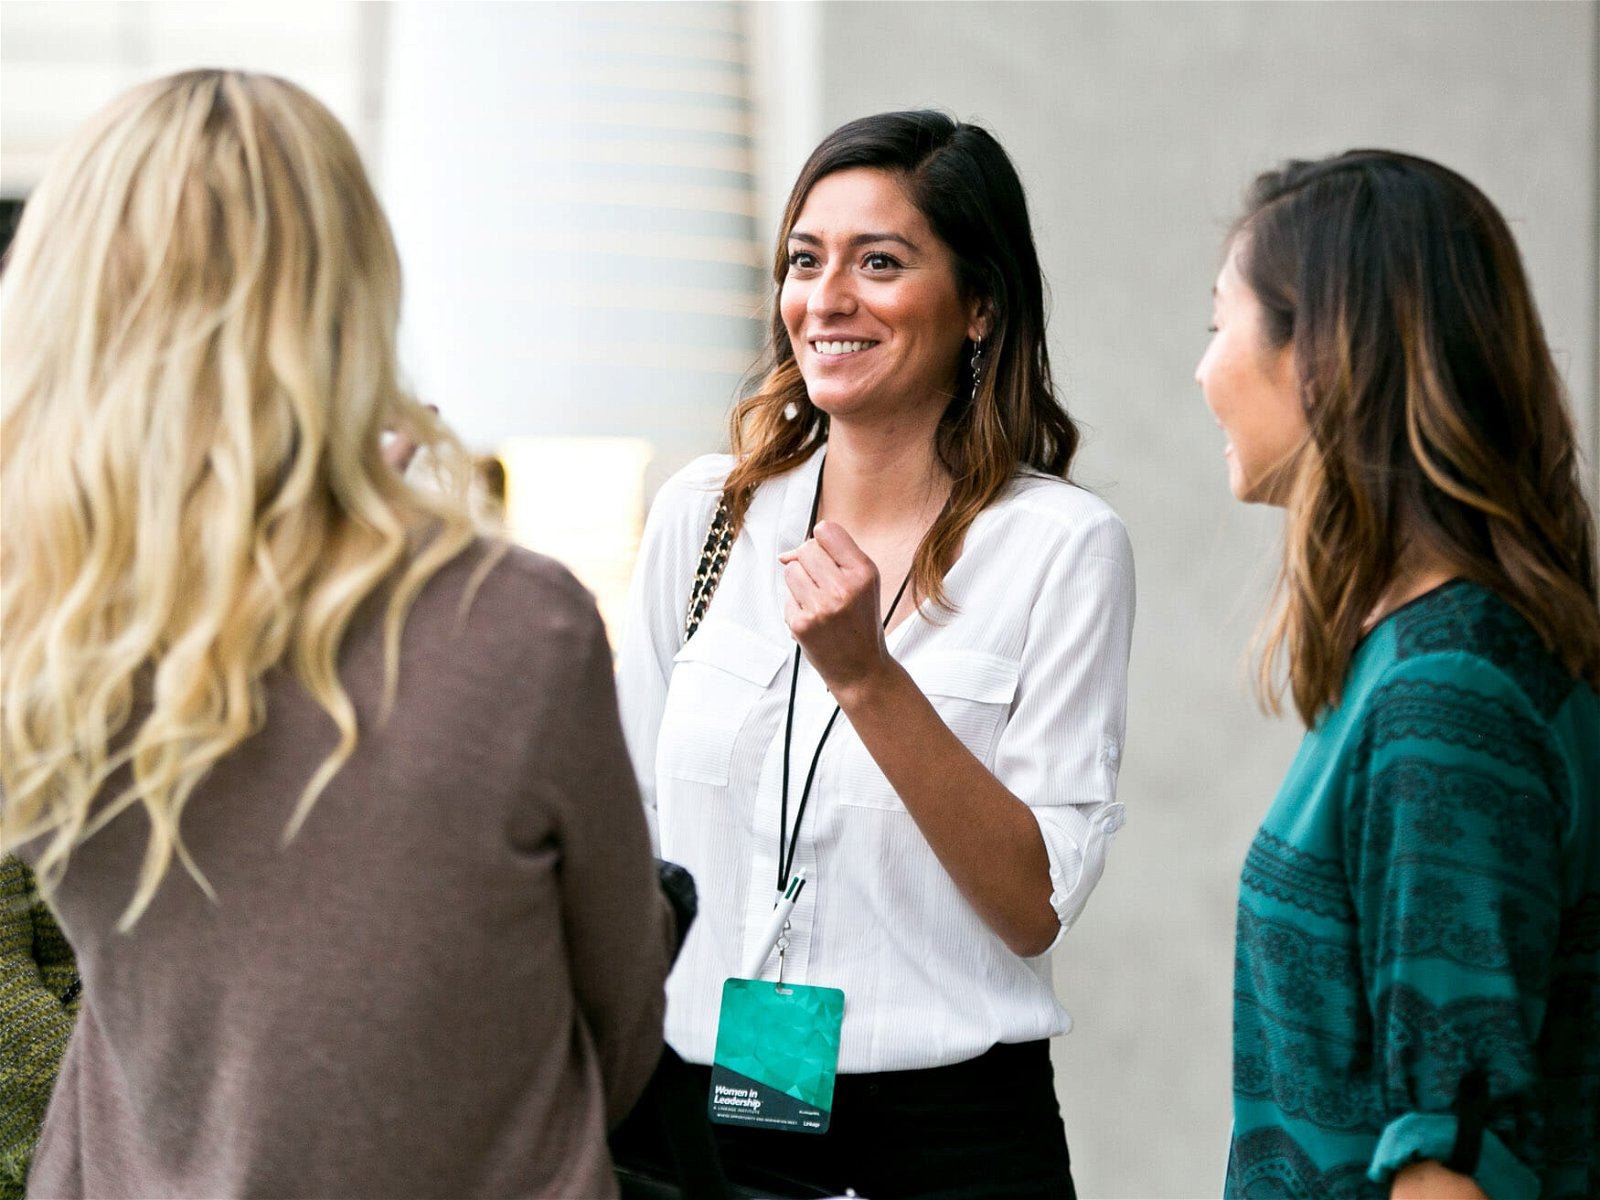 Three female professionals talk outside